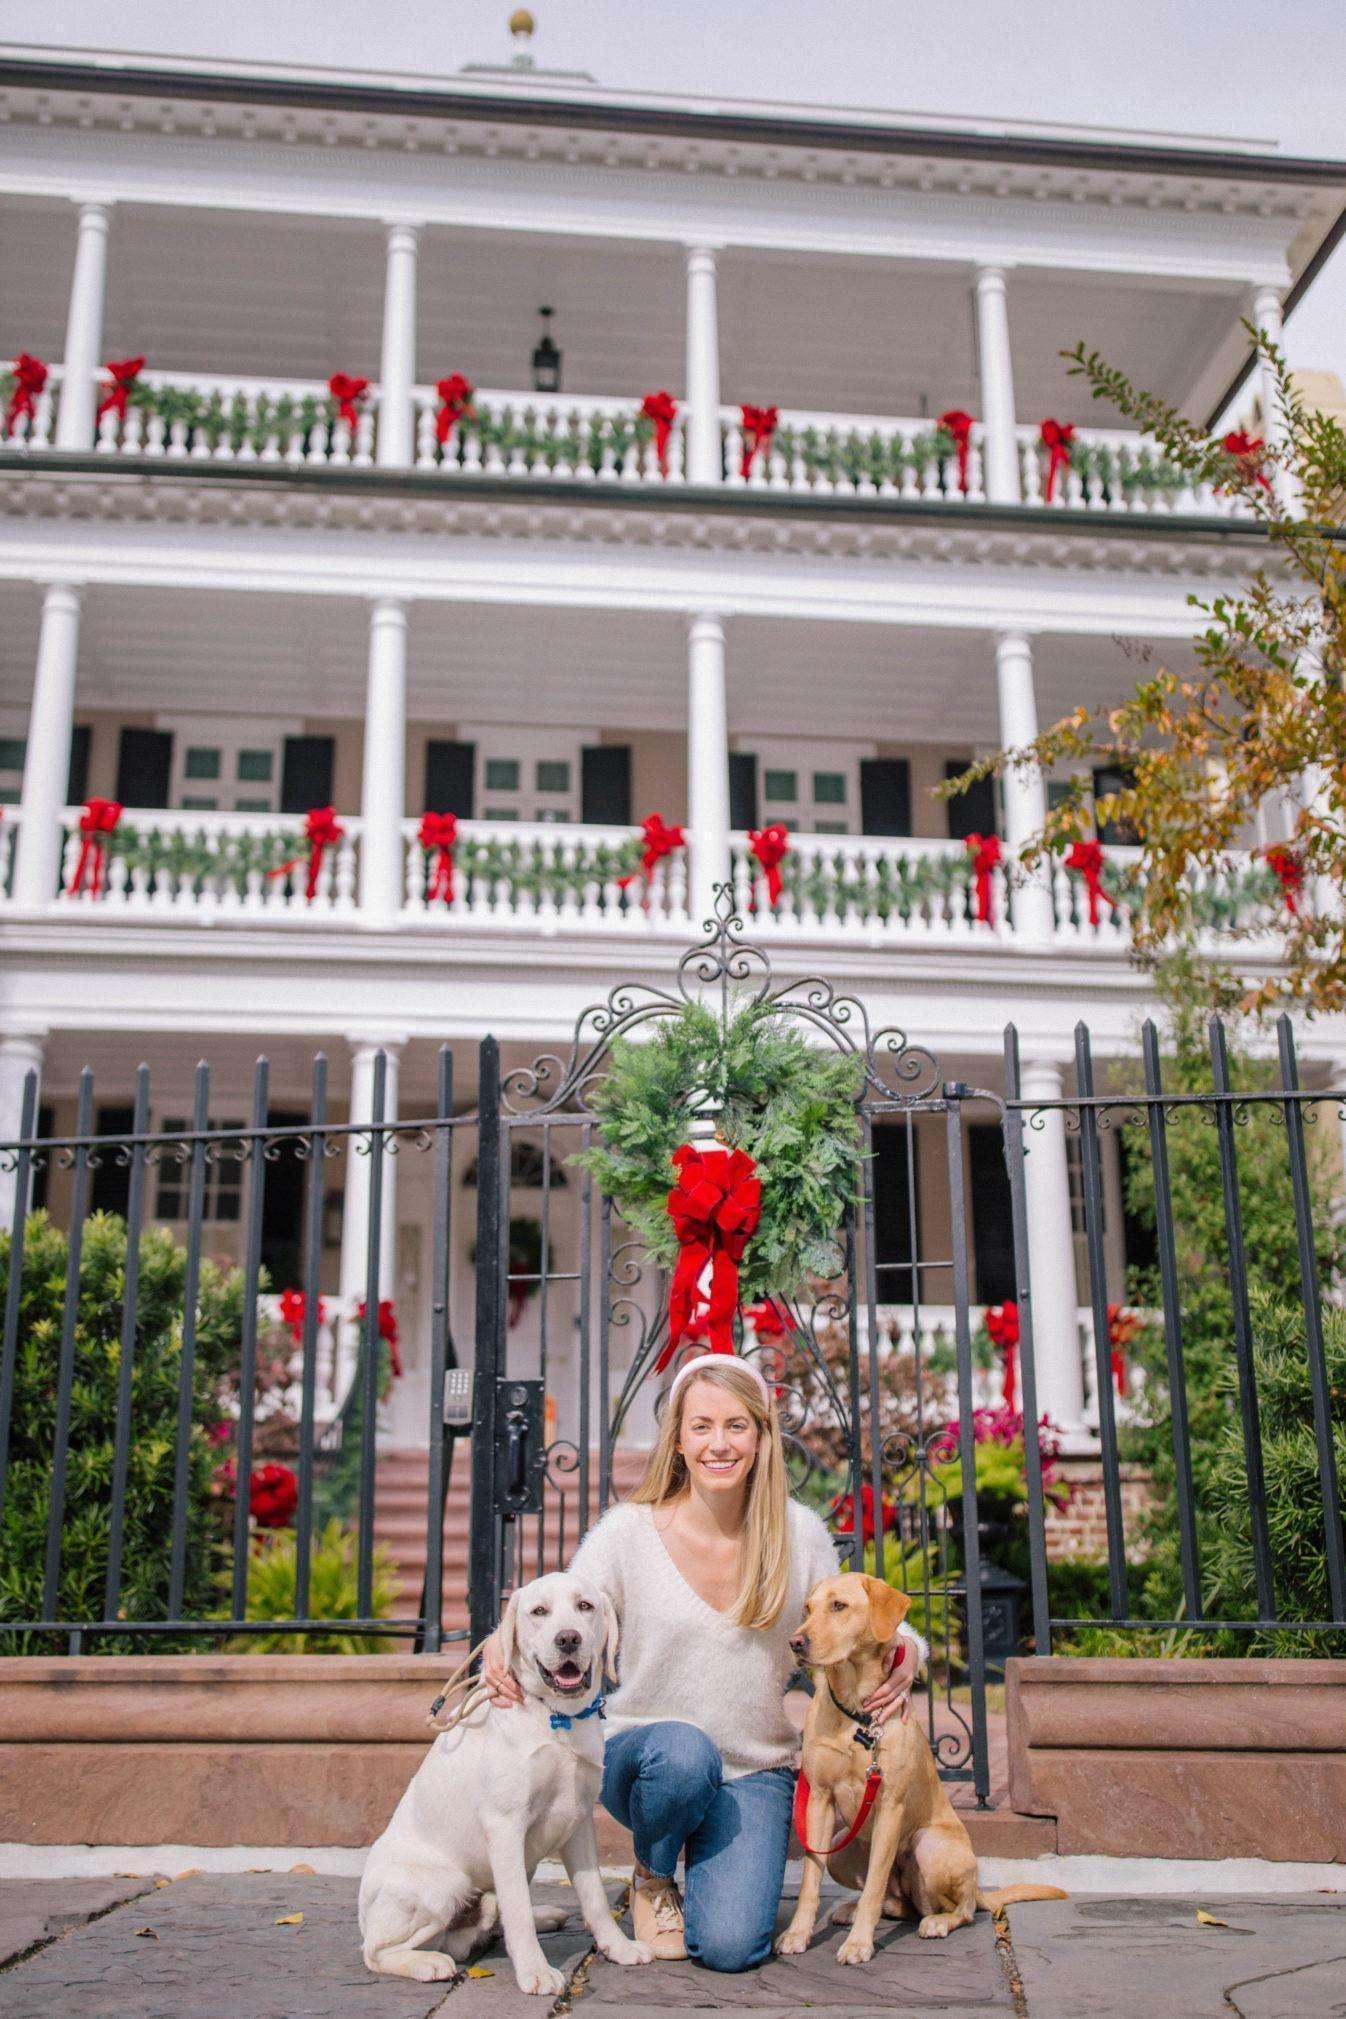 Christmas Spirit in Charleston + Weekend Reads, No. 114 | Rhyme & Reason